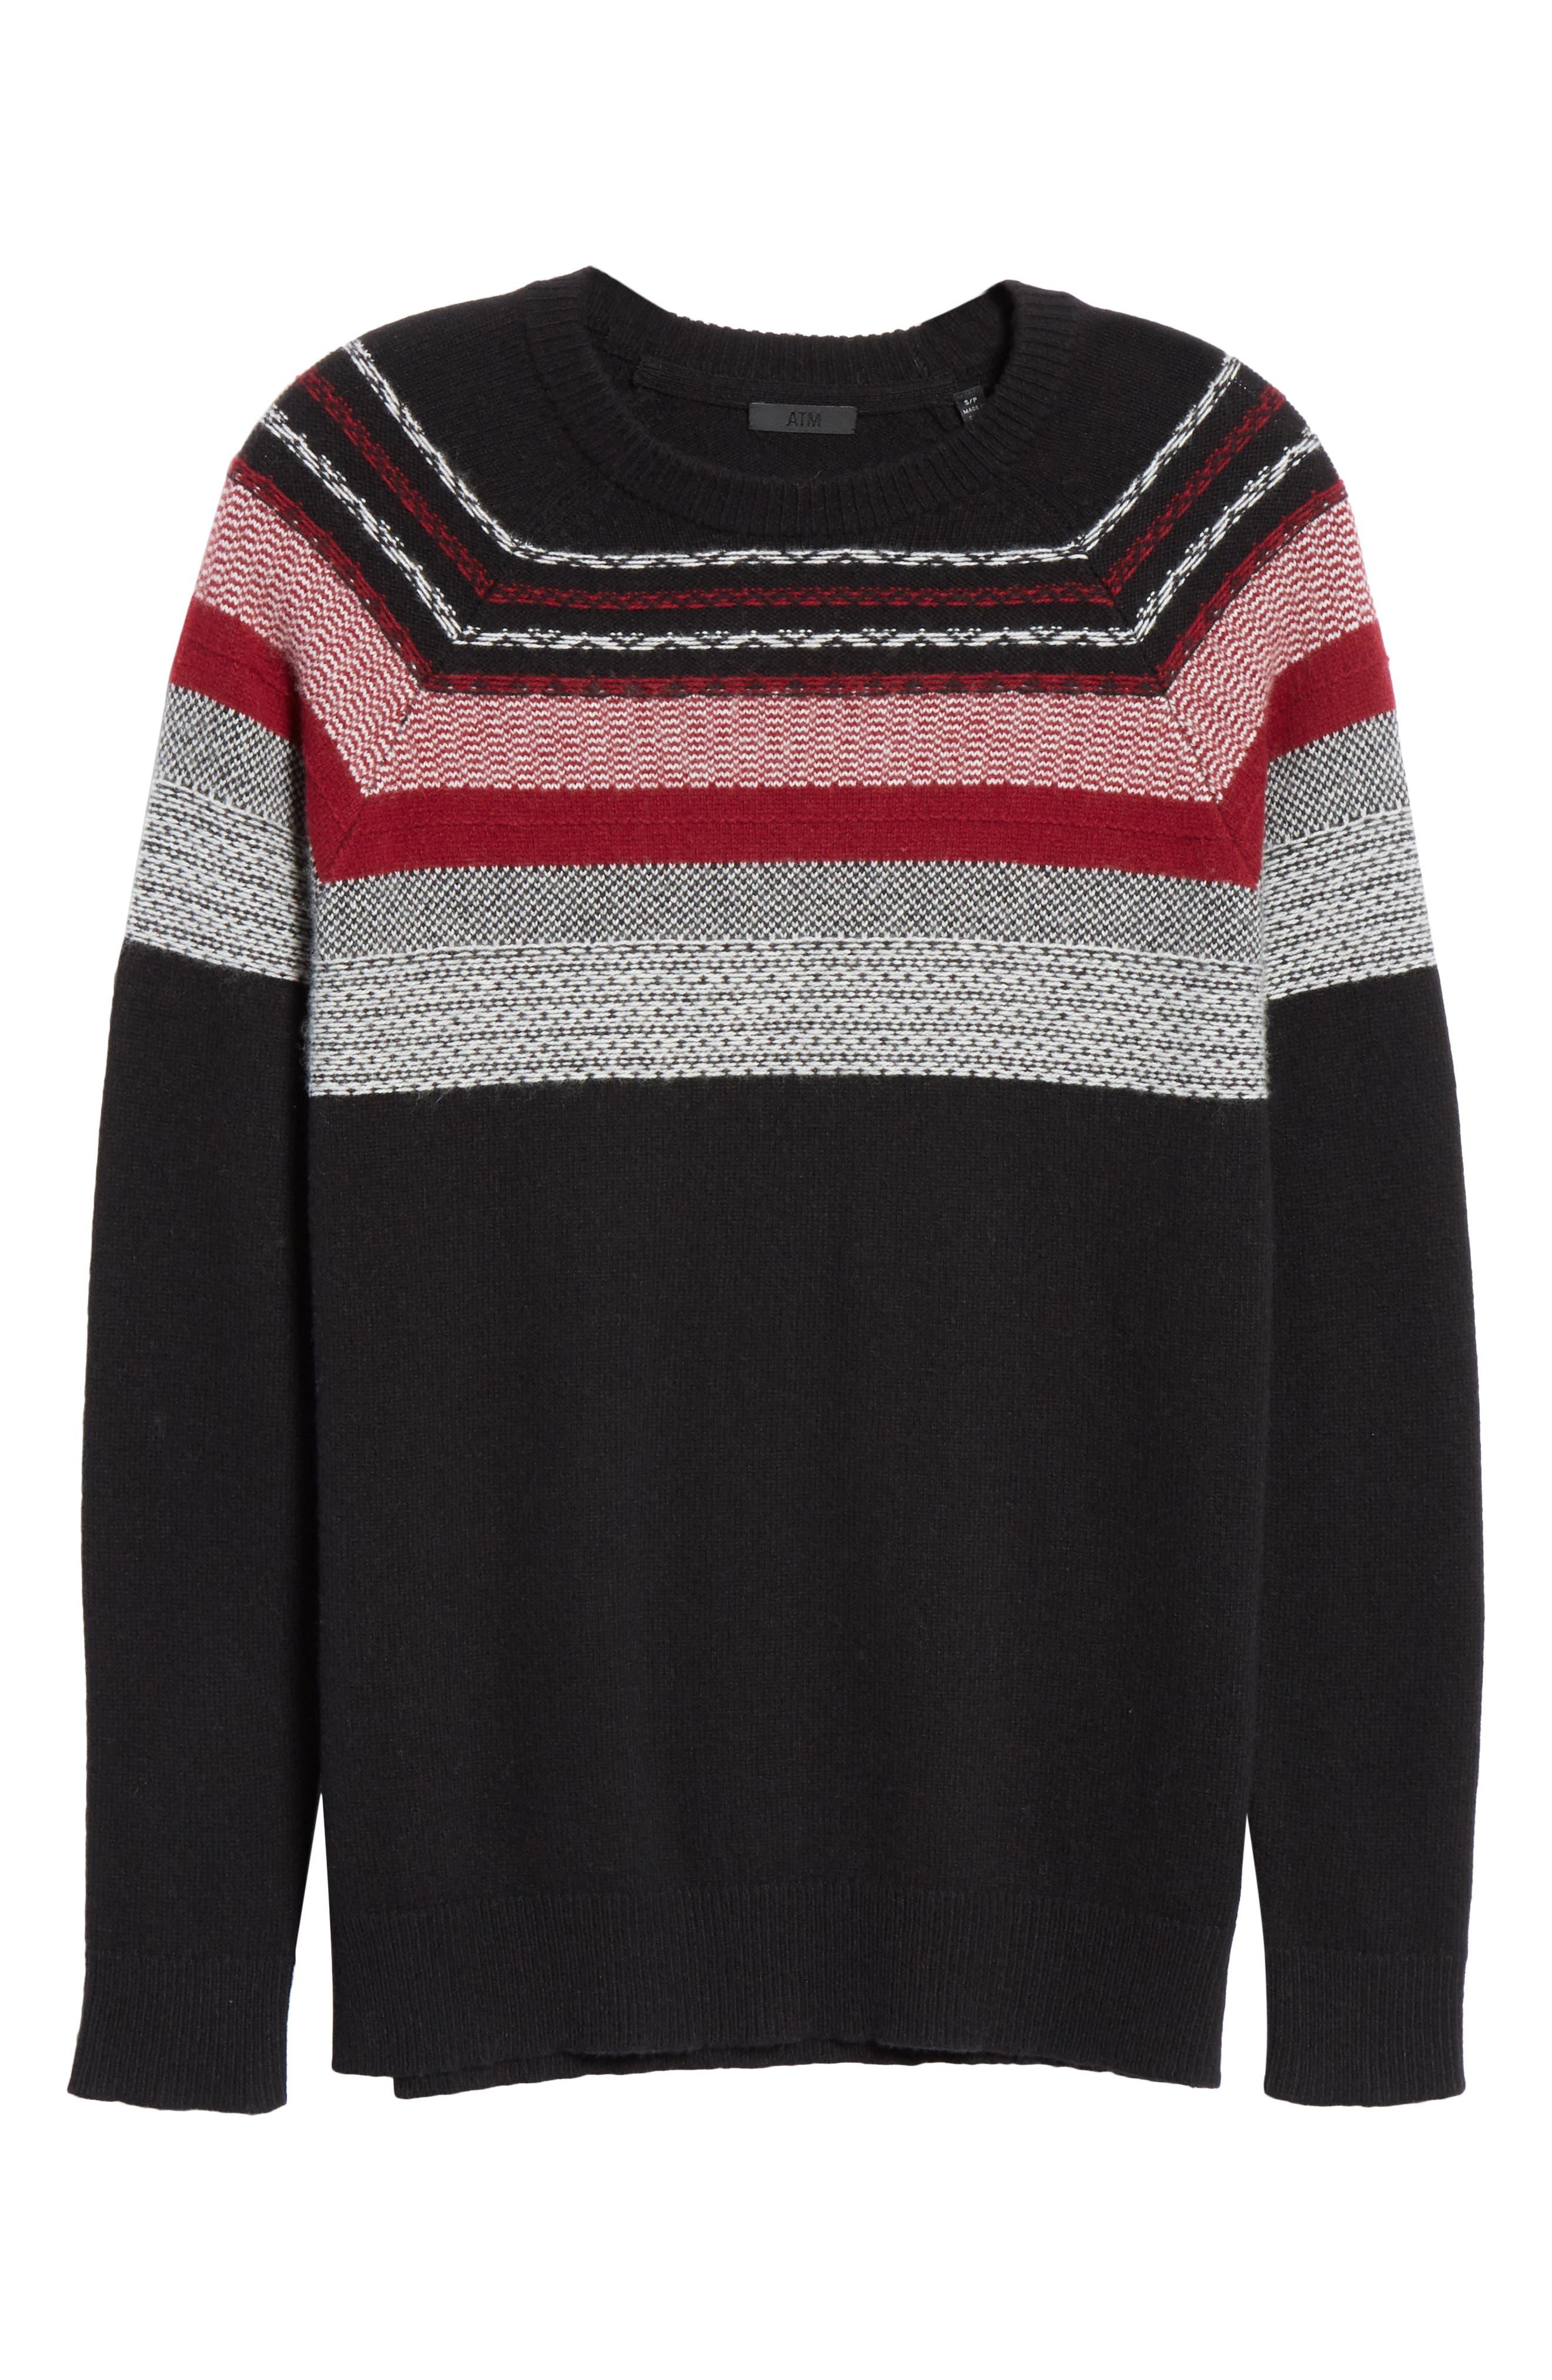 Fair Isle Merino Wool Blend Sweater,                             Alternate thumbnail 6, color,                             BLACK/ RED COMBO